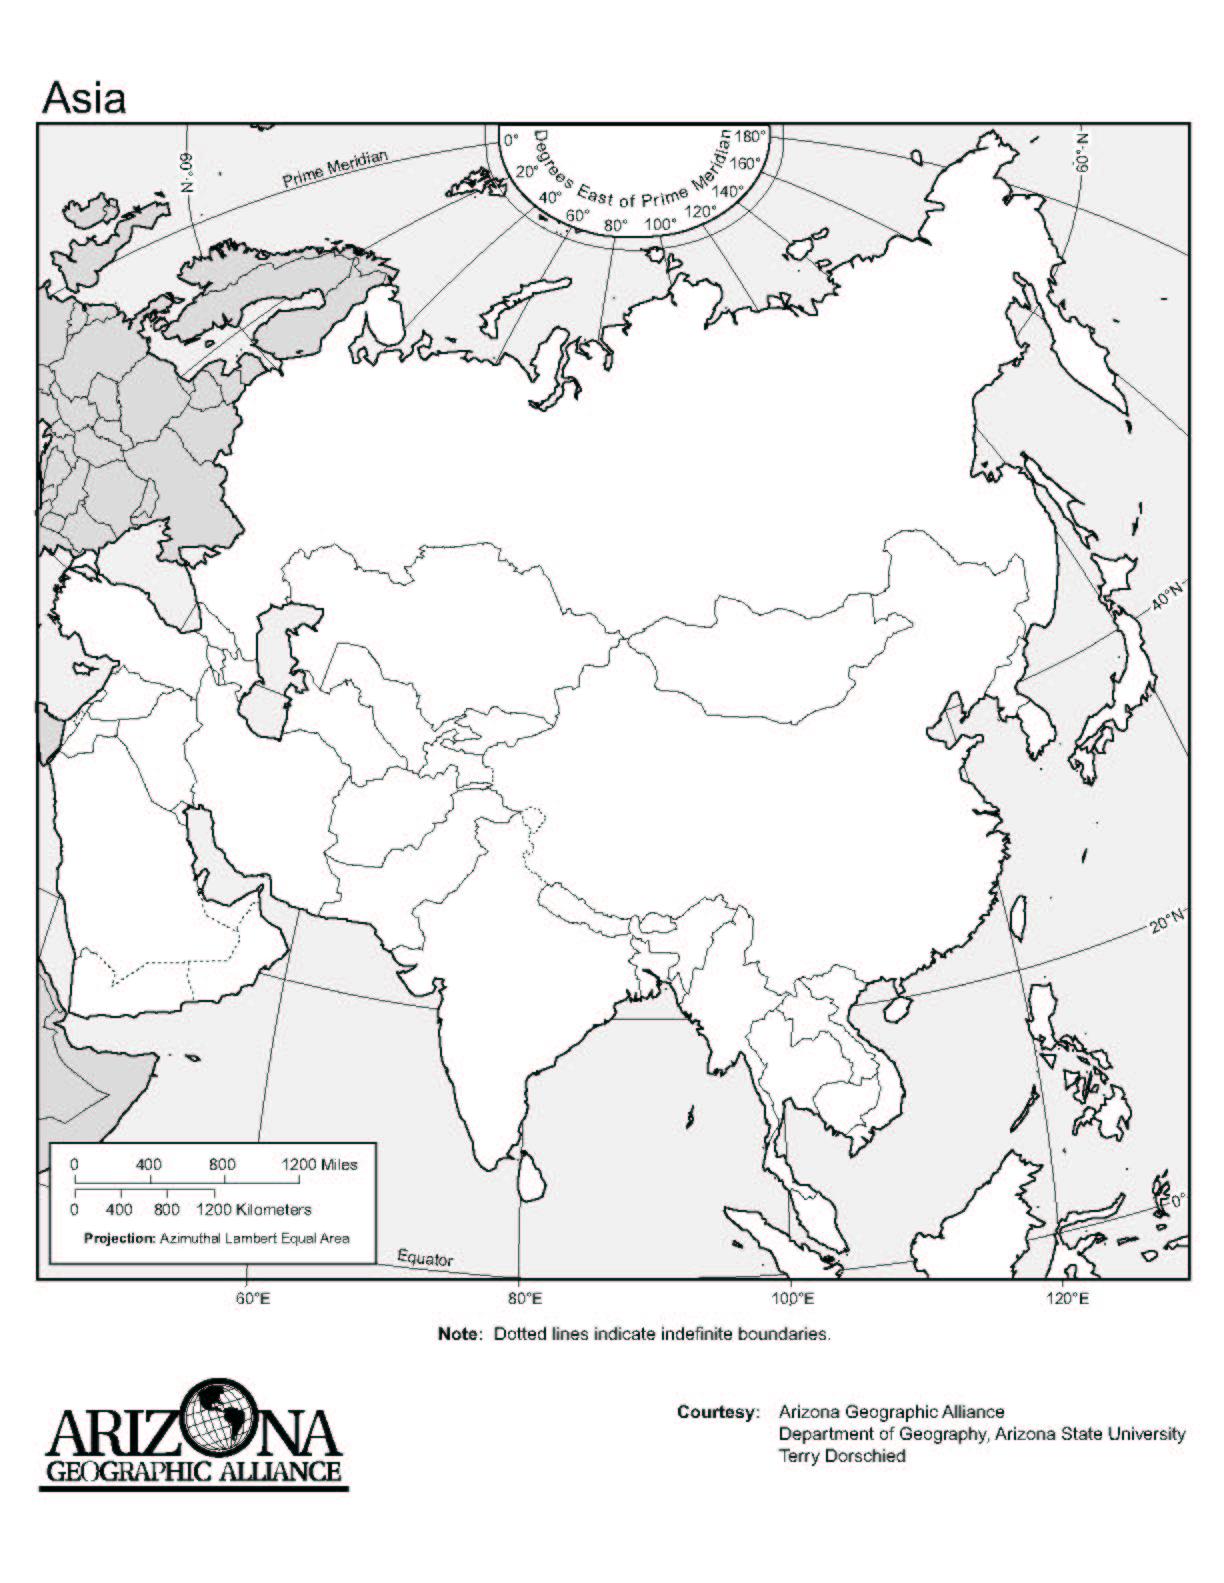 UML Course Wikis Map Quiz Resources